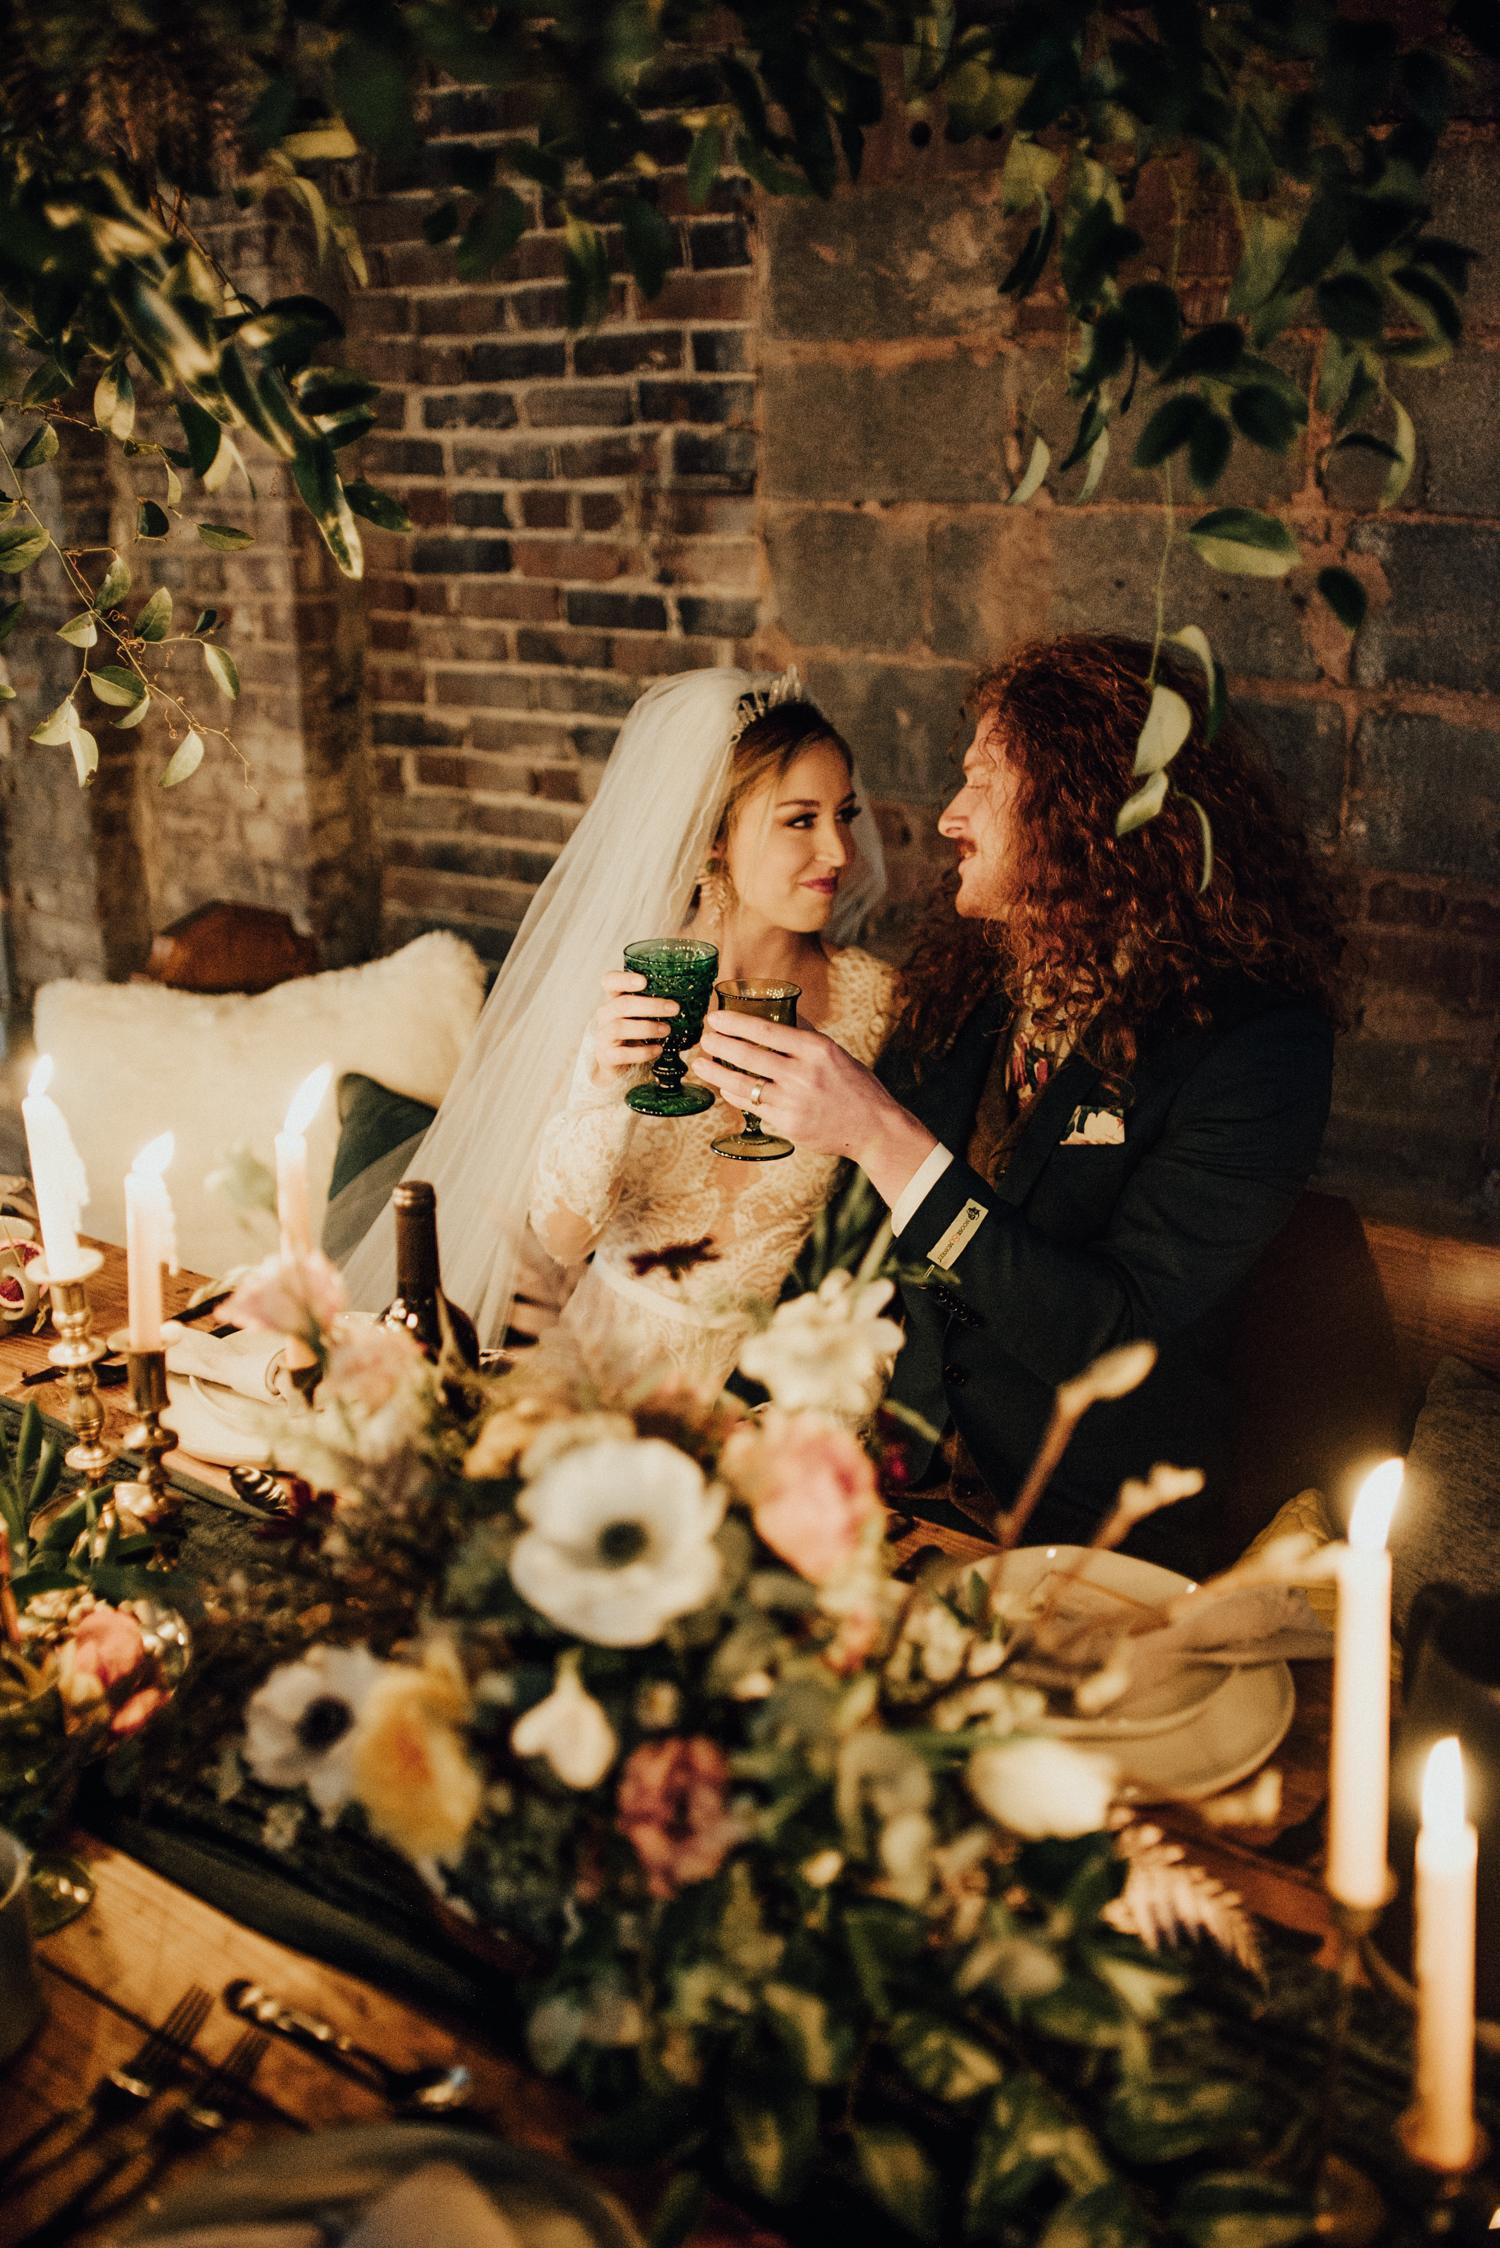 St-Louis-wedding-photographers-104.jpg